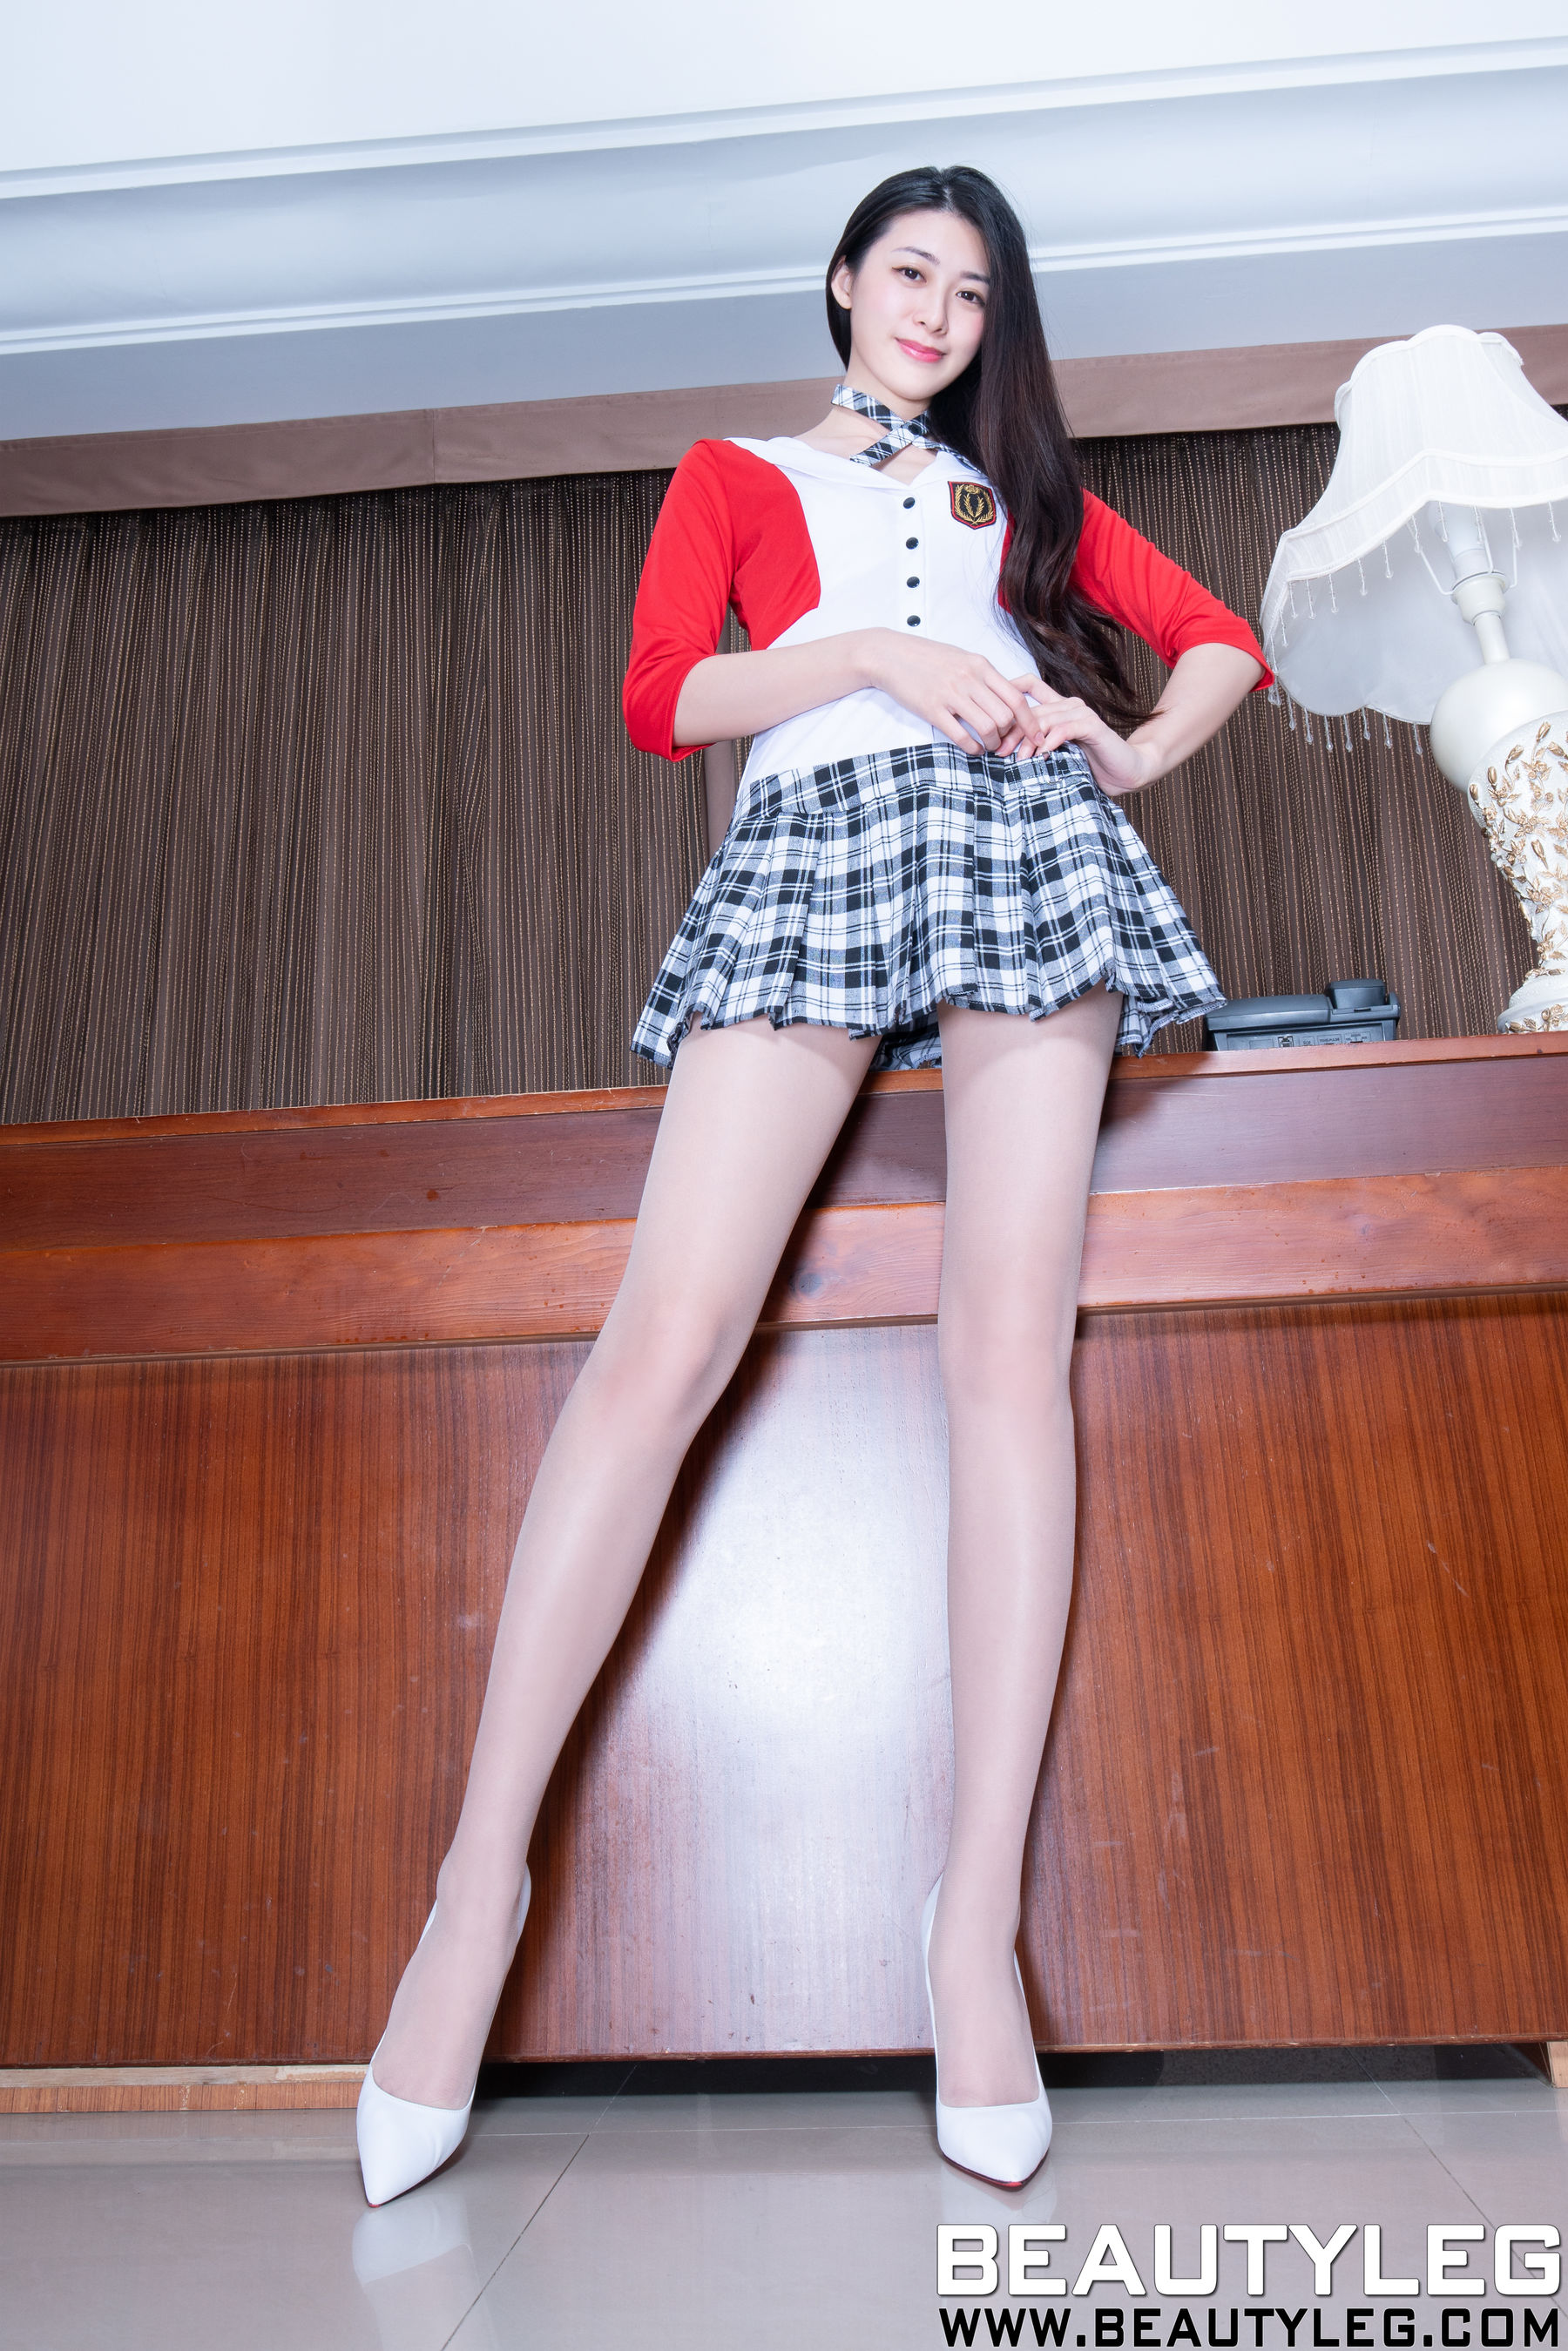 VOL.926 [Beautyleg]肉丝袜长腿美女:蔡茵茵(腿模Flora)超高清个人性感漂亮大图(42P)